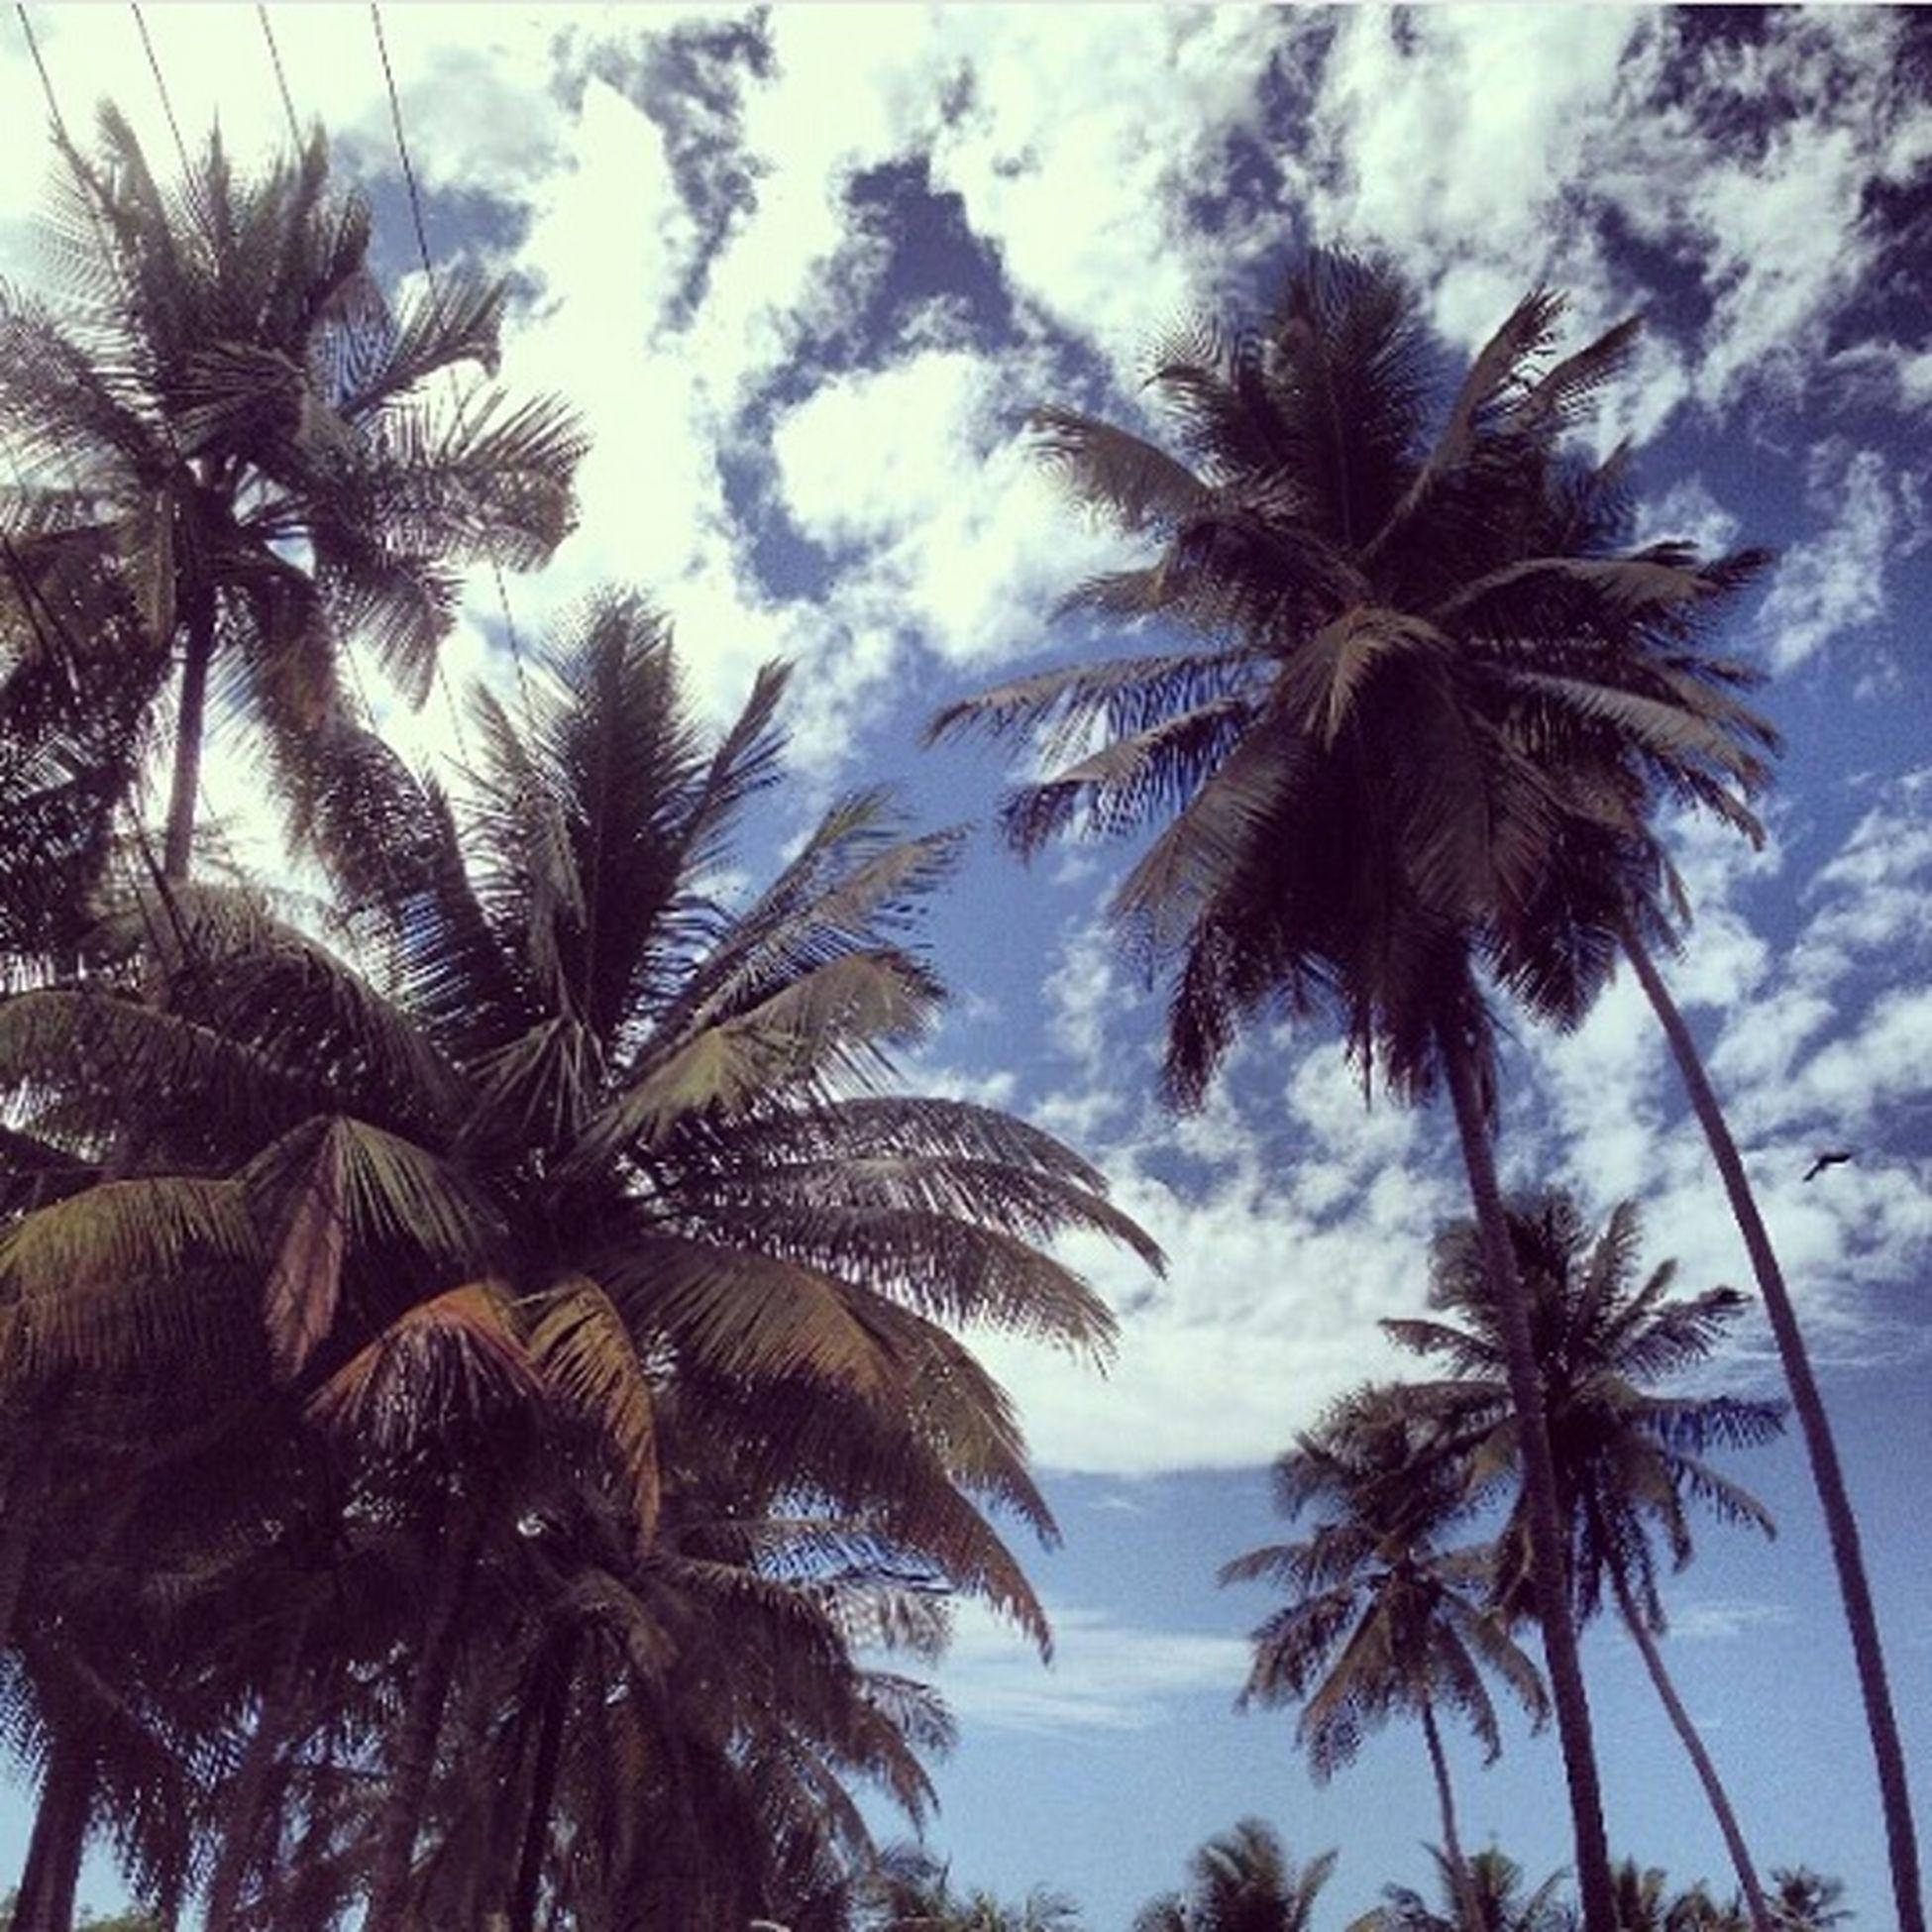 Pams Sky Clouds Goa Freedom Happy